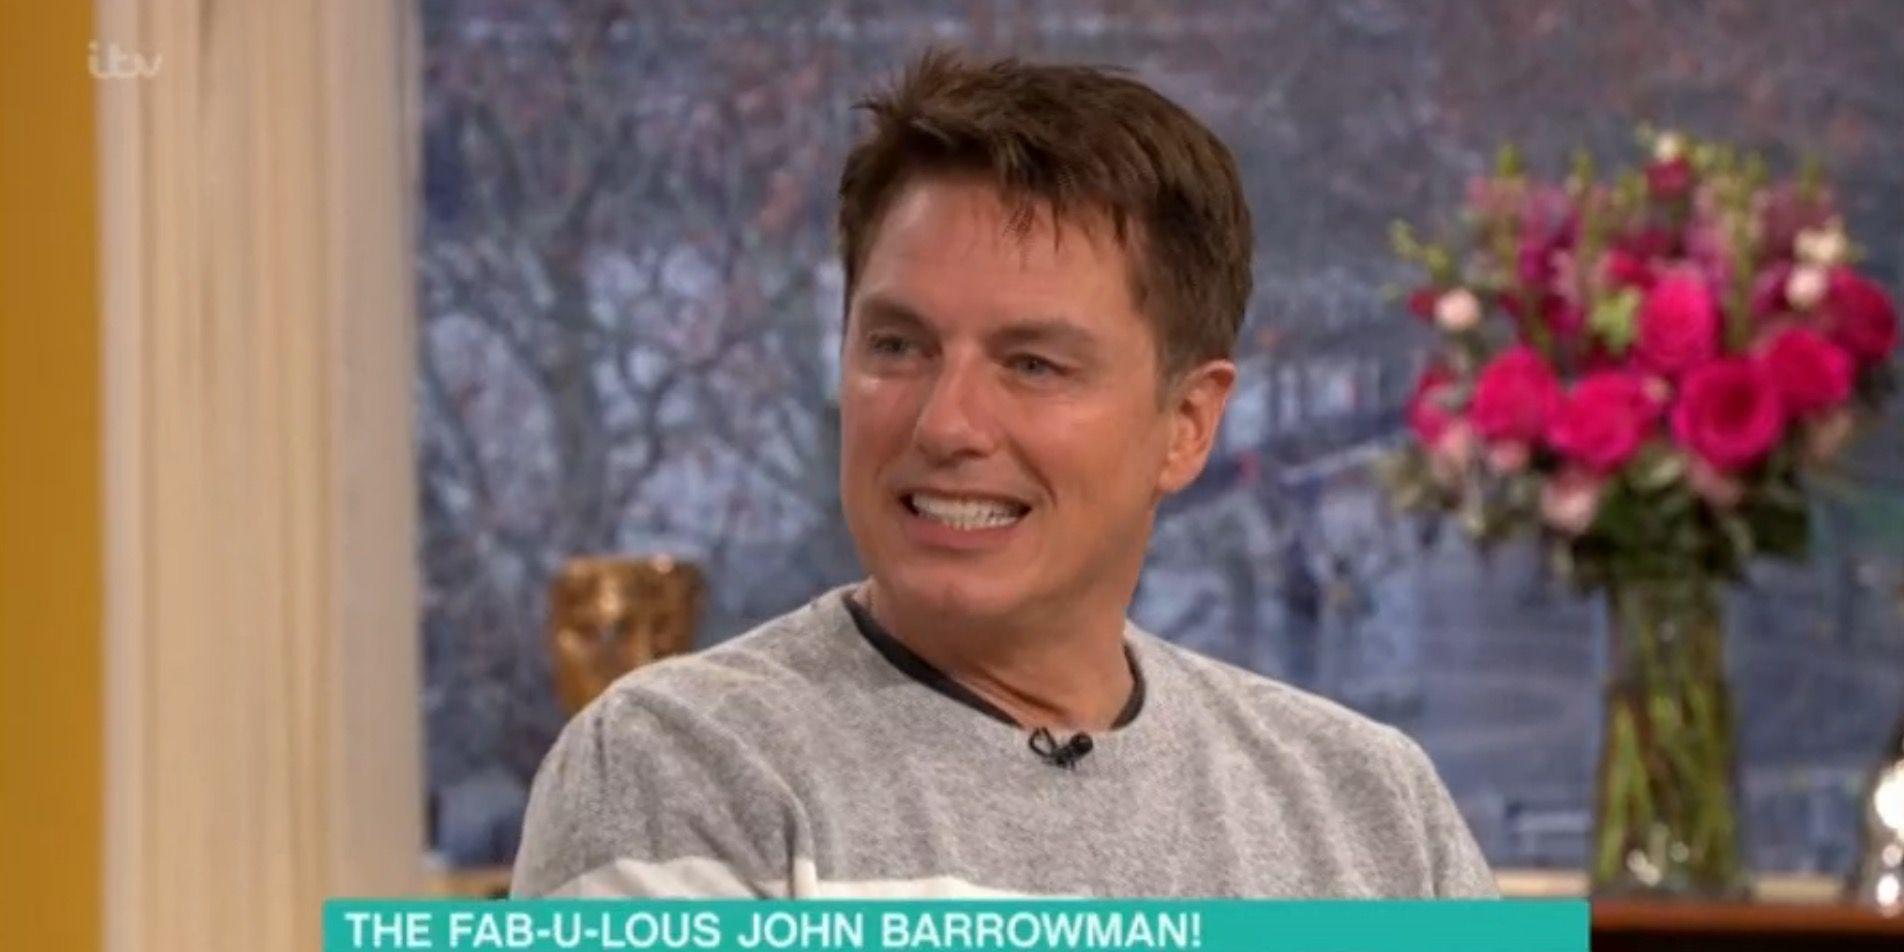 This Morning John Barrowman / I'm a Celebrity